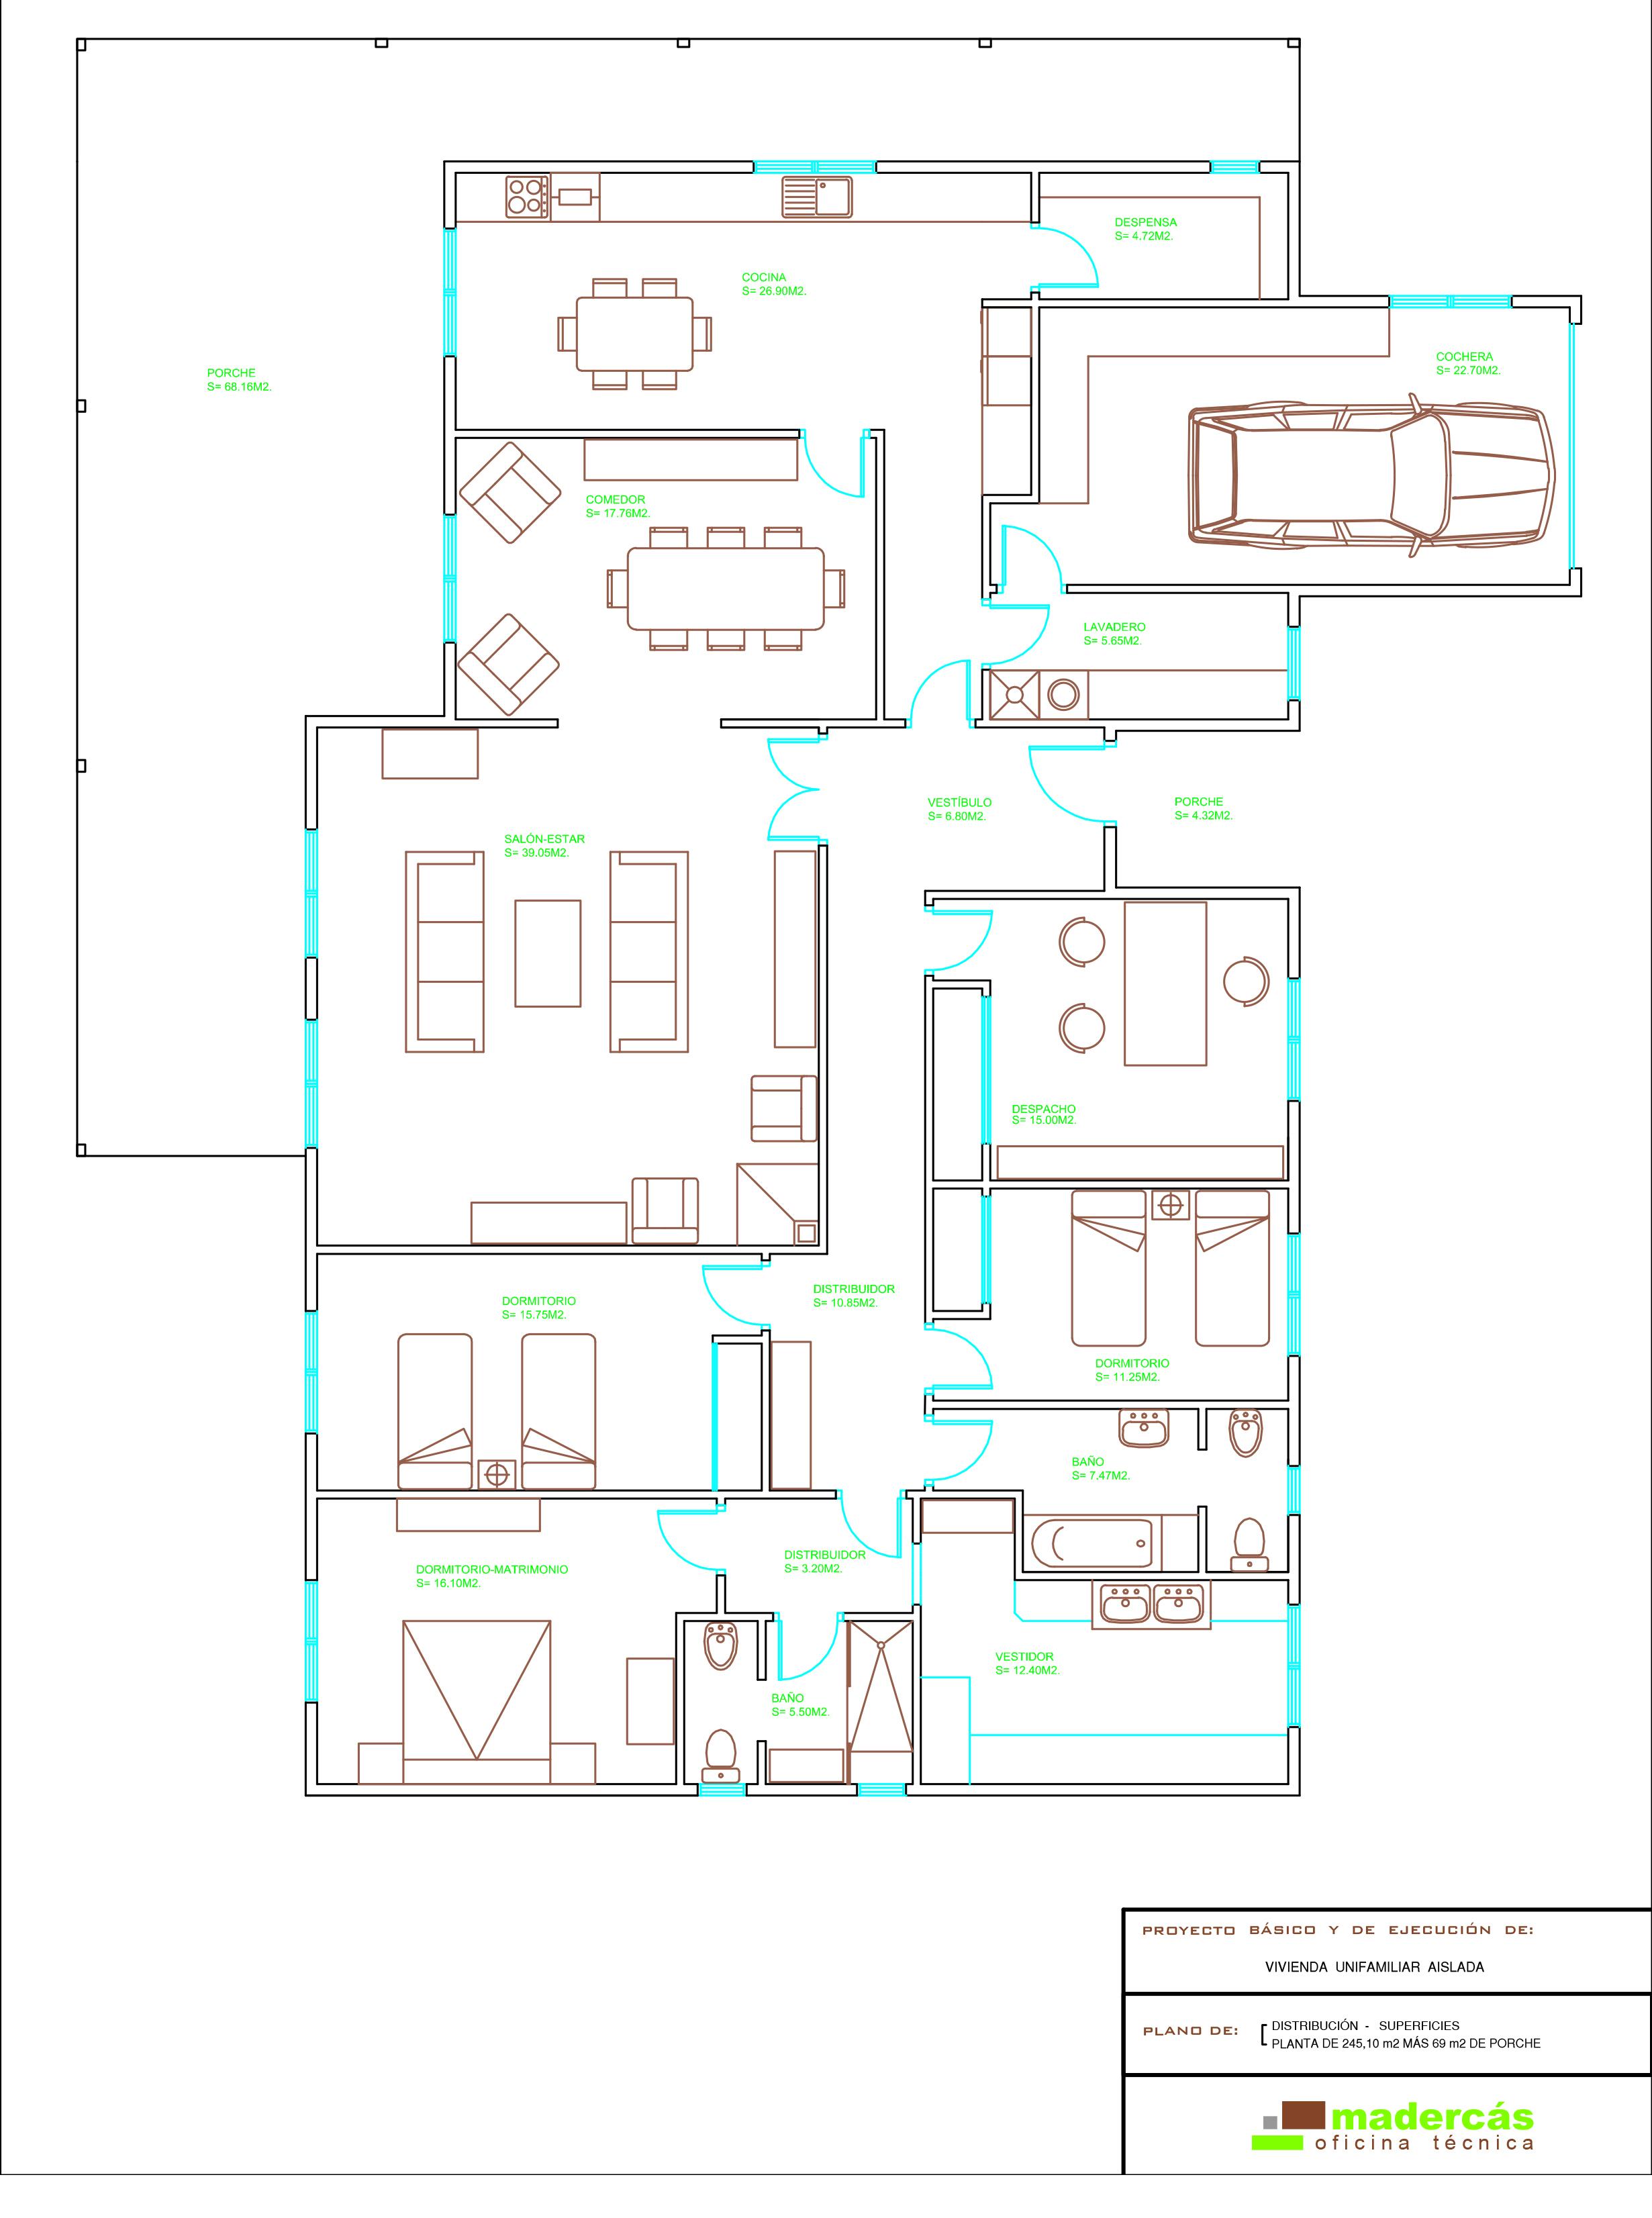 Fabricación de casas de madera modulares, prefabricadas, distribución a elegir, acabados perfectos, posibilidad de exteriores sin mantenimiento